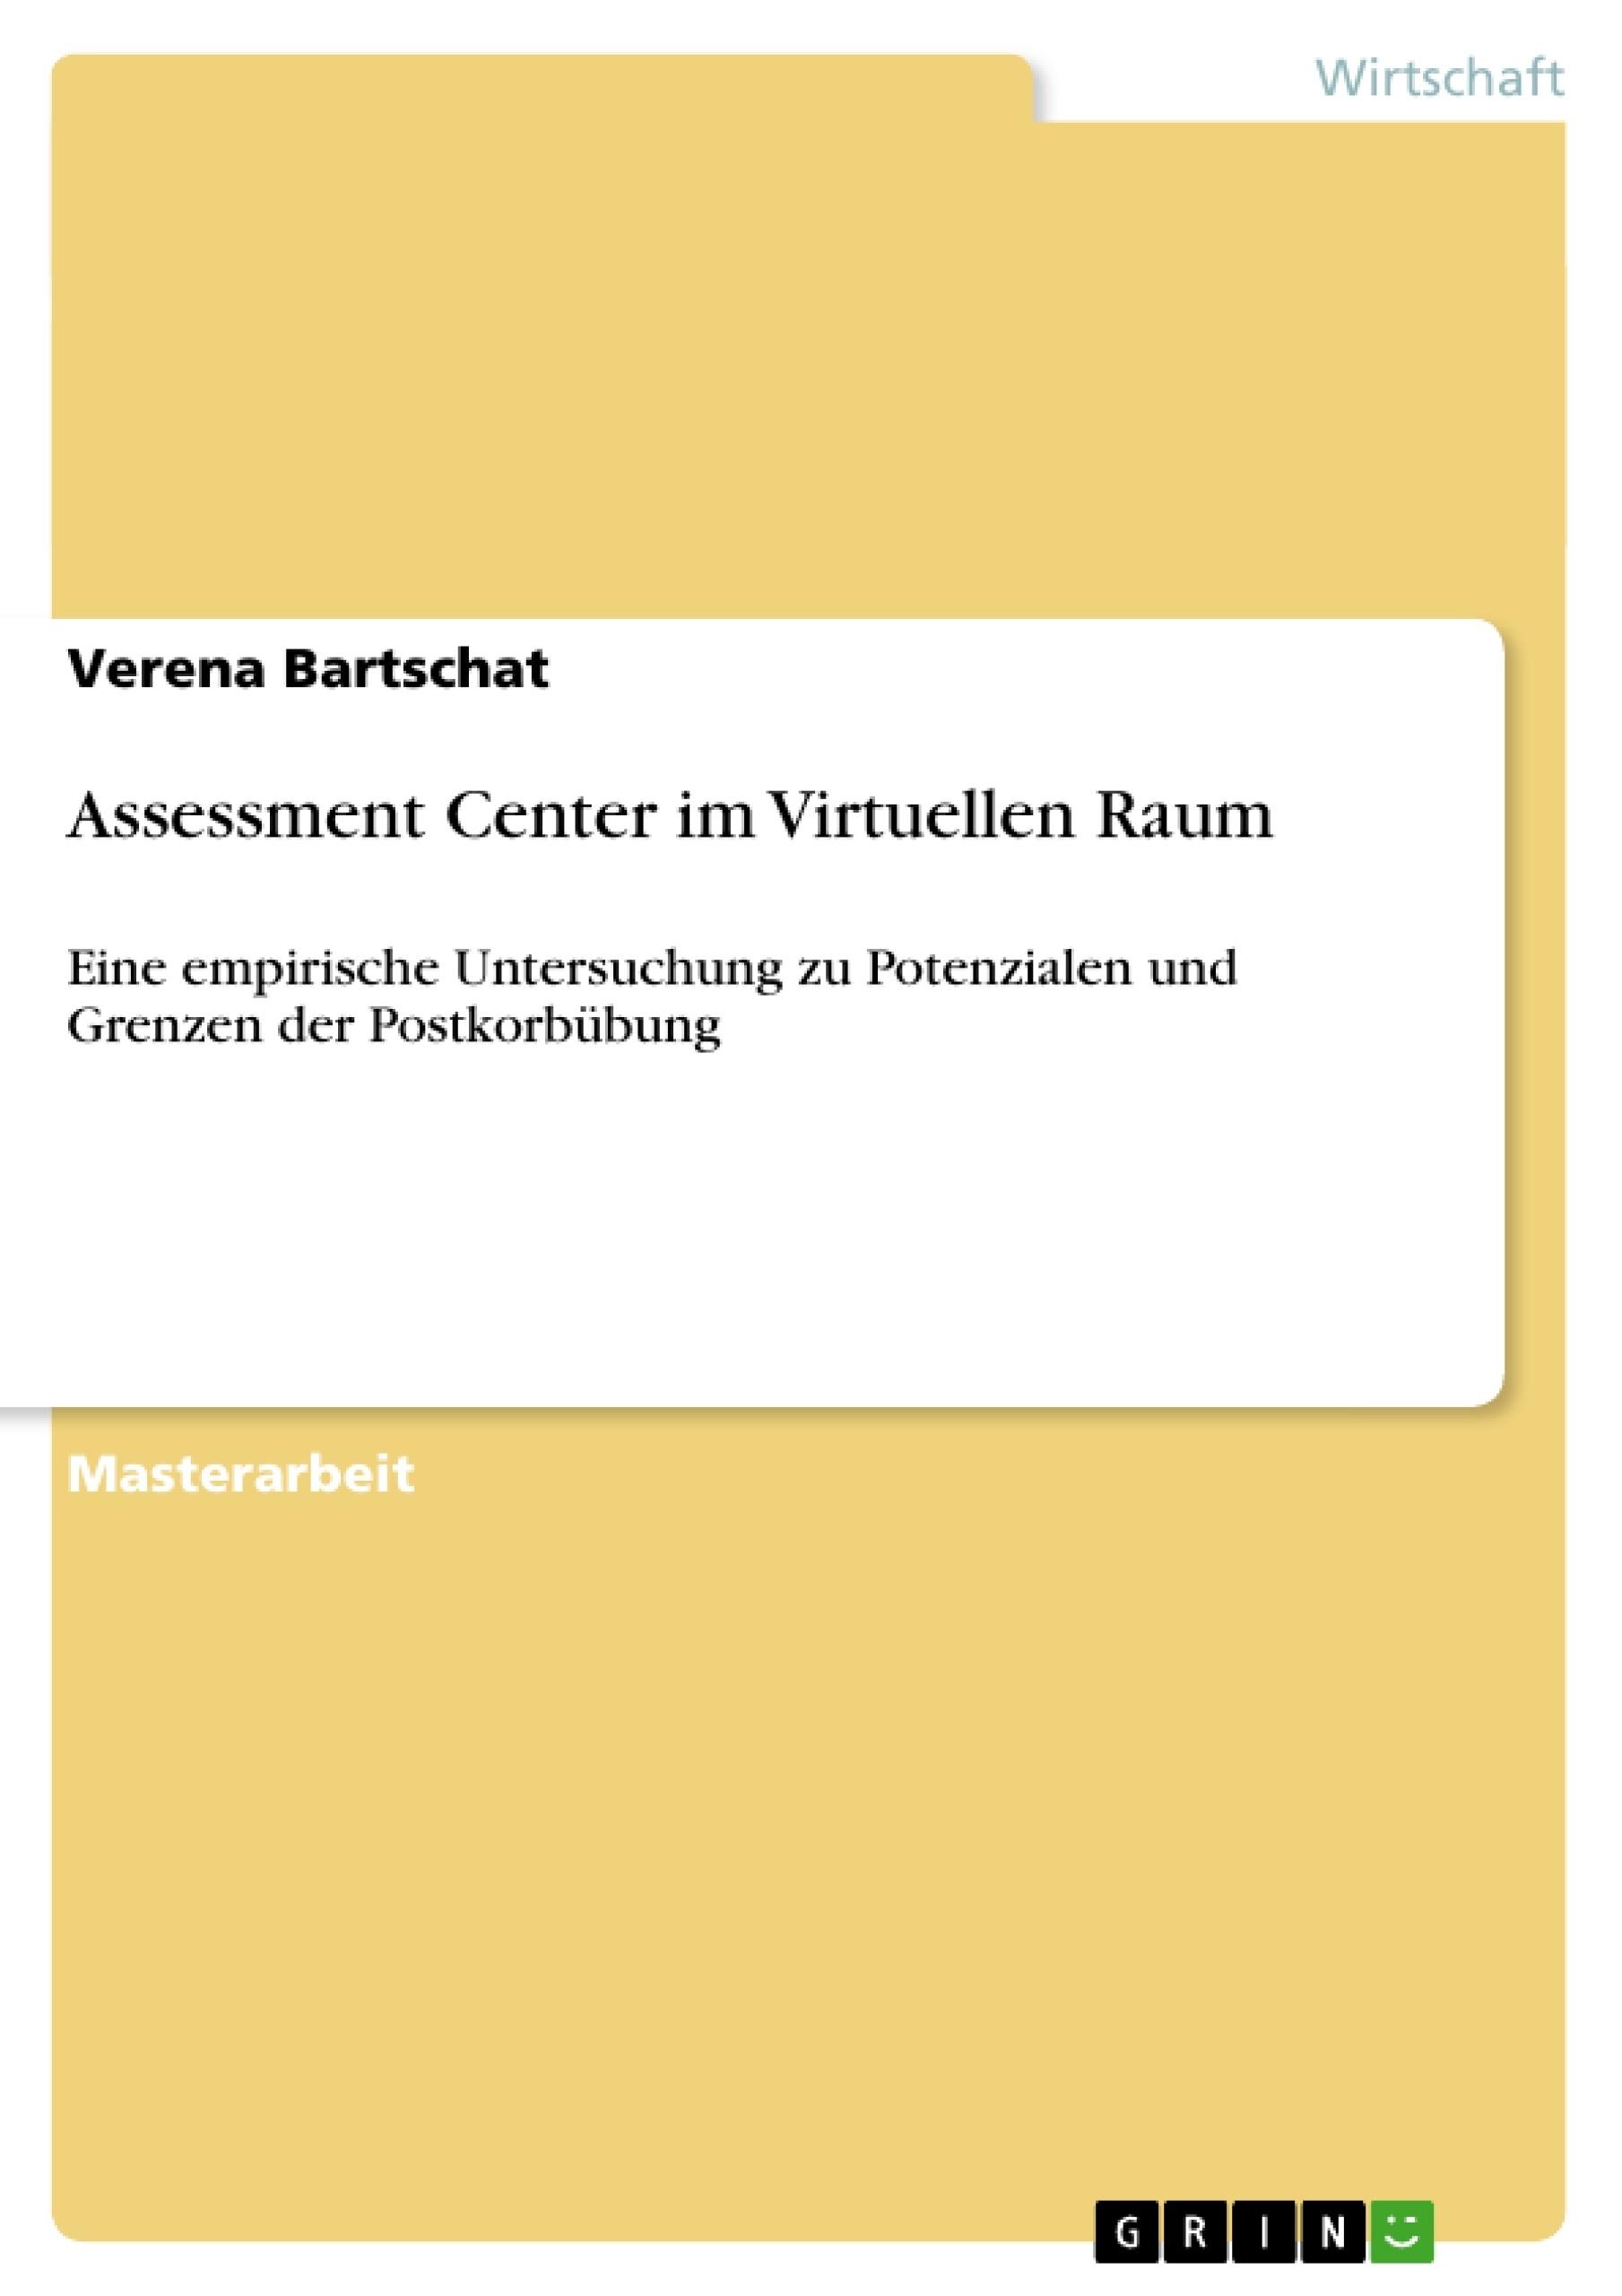 Titel: Assessment Center im Virtuellen Raum